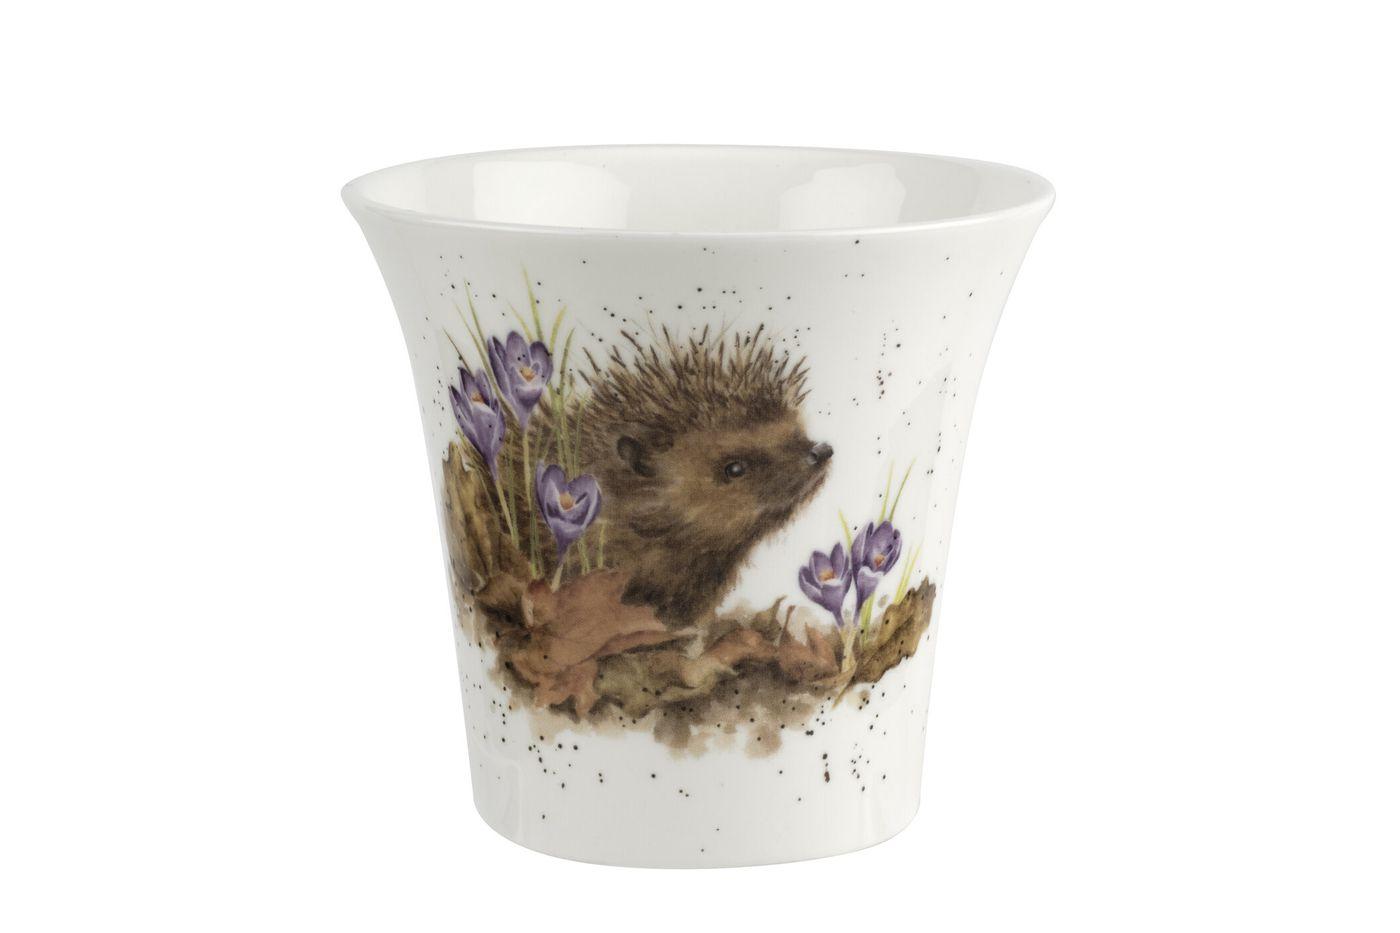 Royal Worcester Wrendale Designs Flower Pot 10cm thumb 1